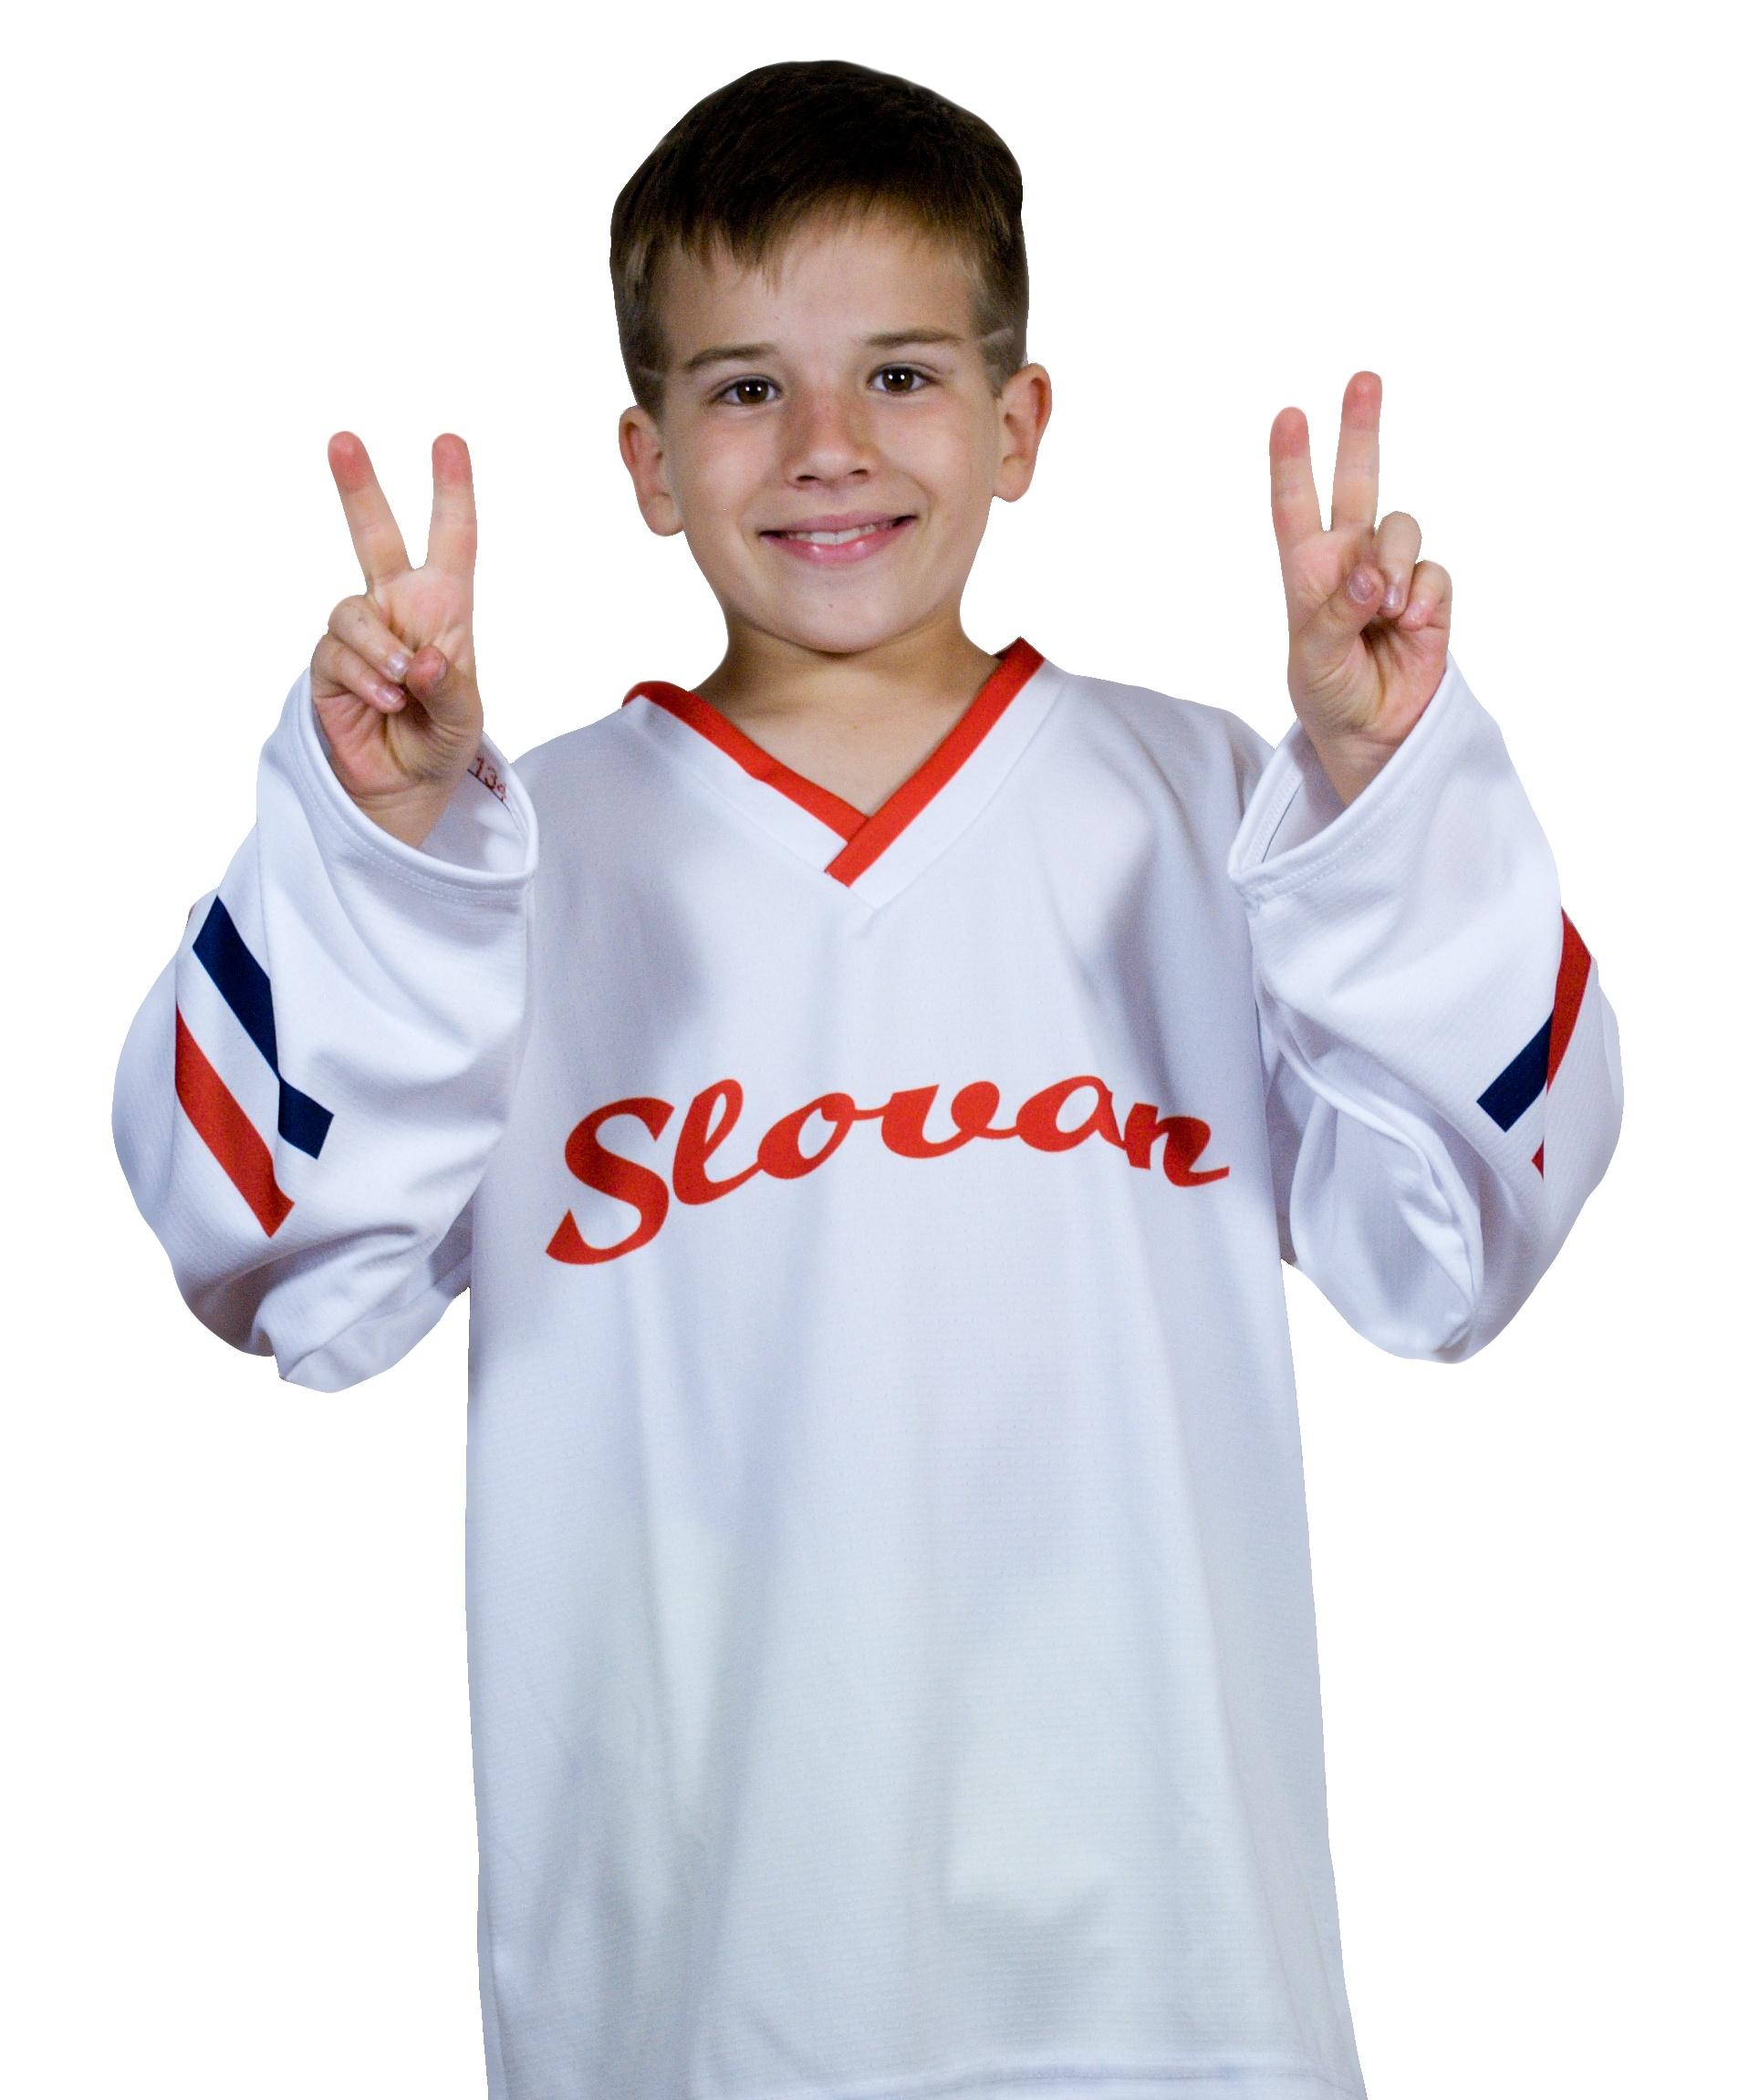 81c437e5b35df Hokejový dres Slovan nápis biely DETSKÝ - Fanshop SB